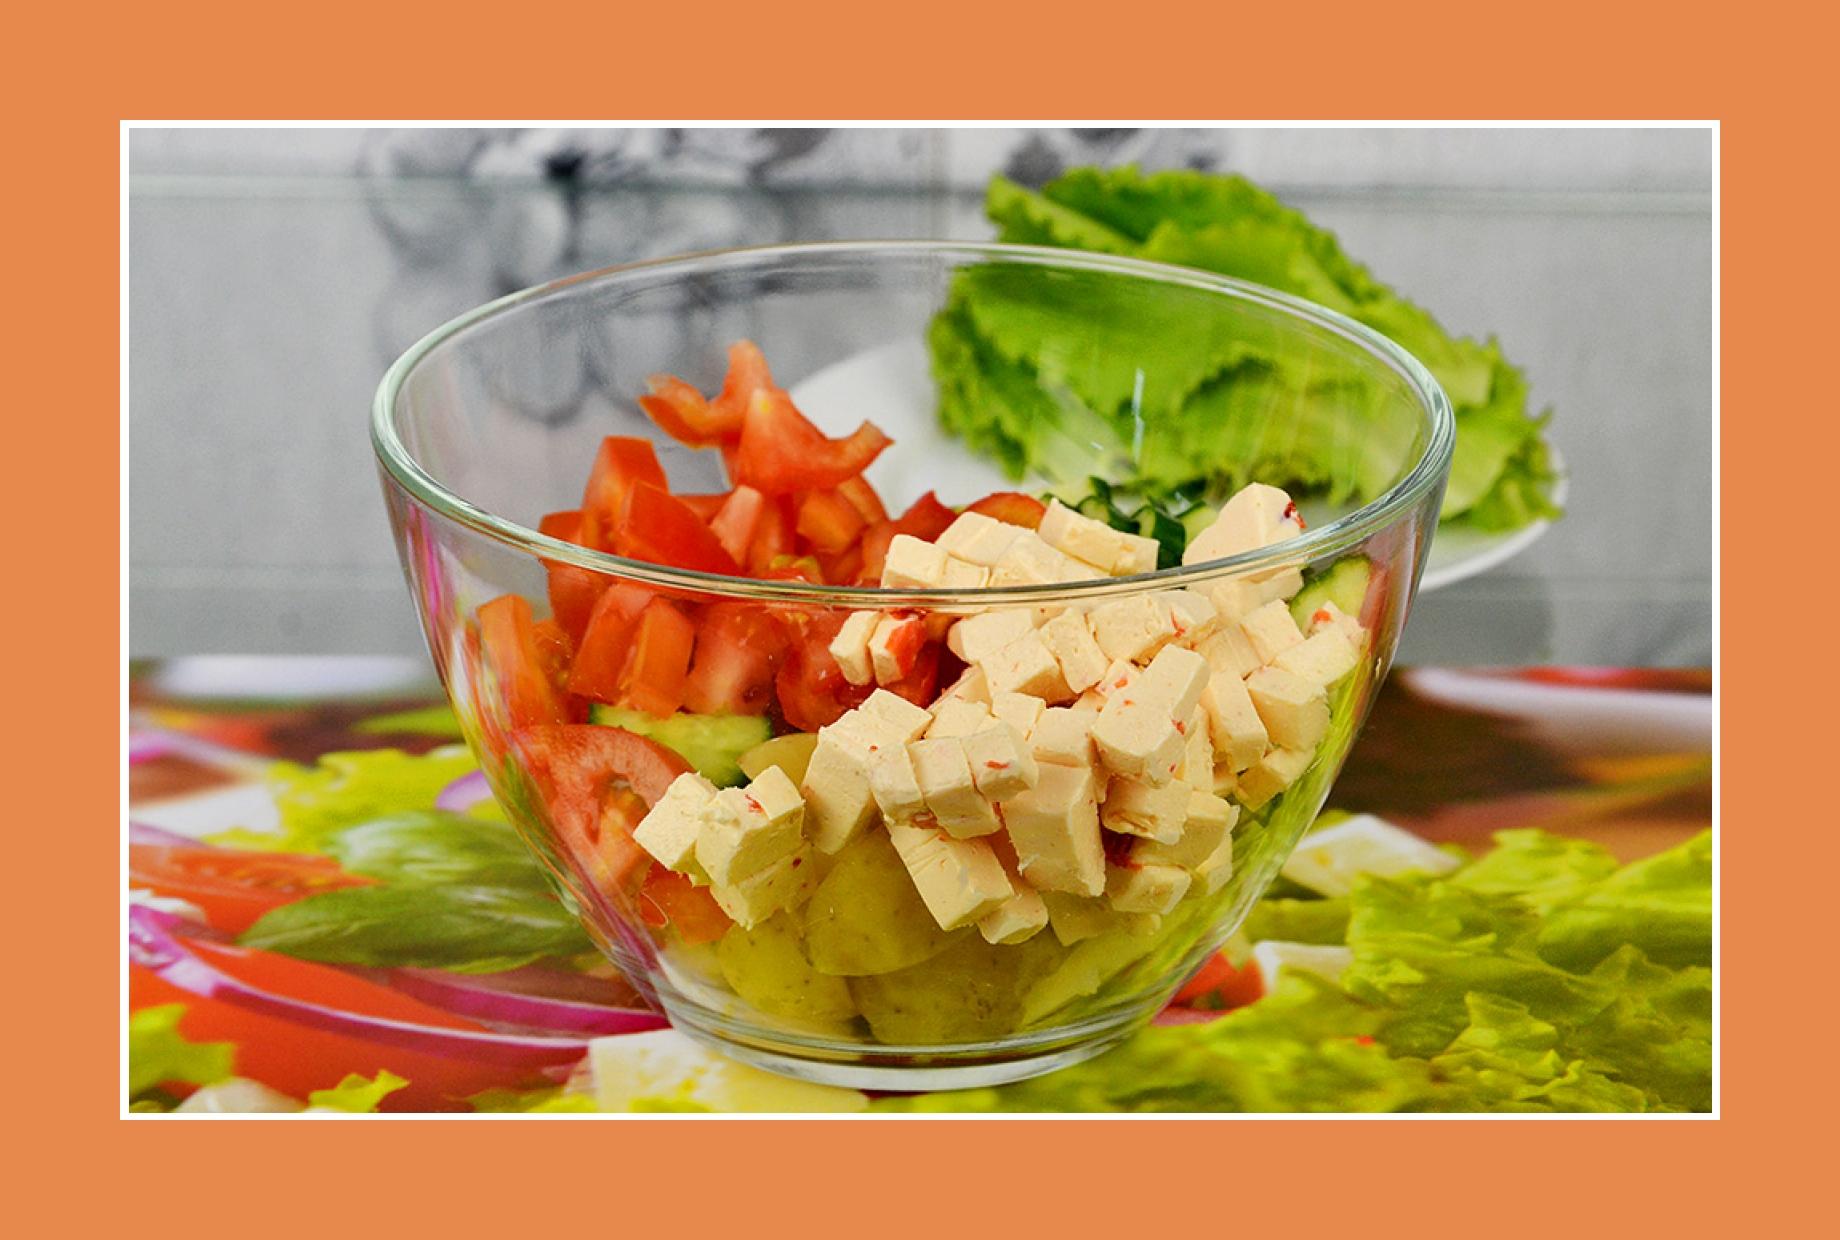 Tomaten Gurken Salat mit Schmelzkäse Kartoffelsalat